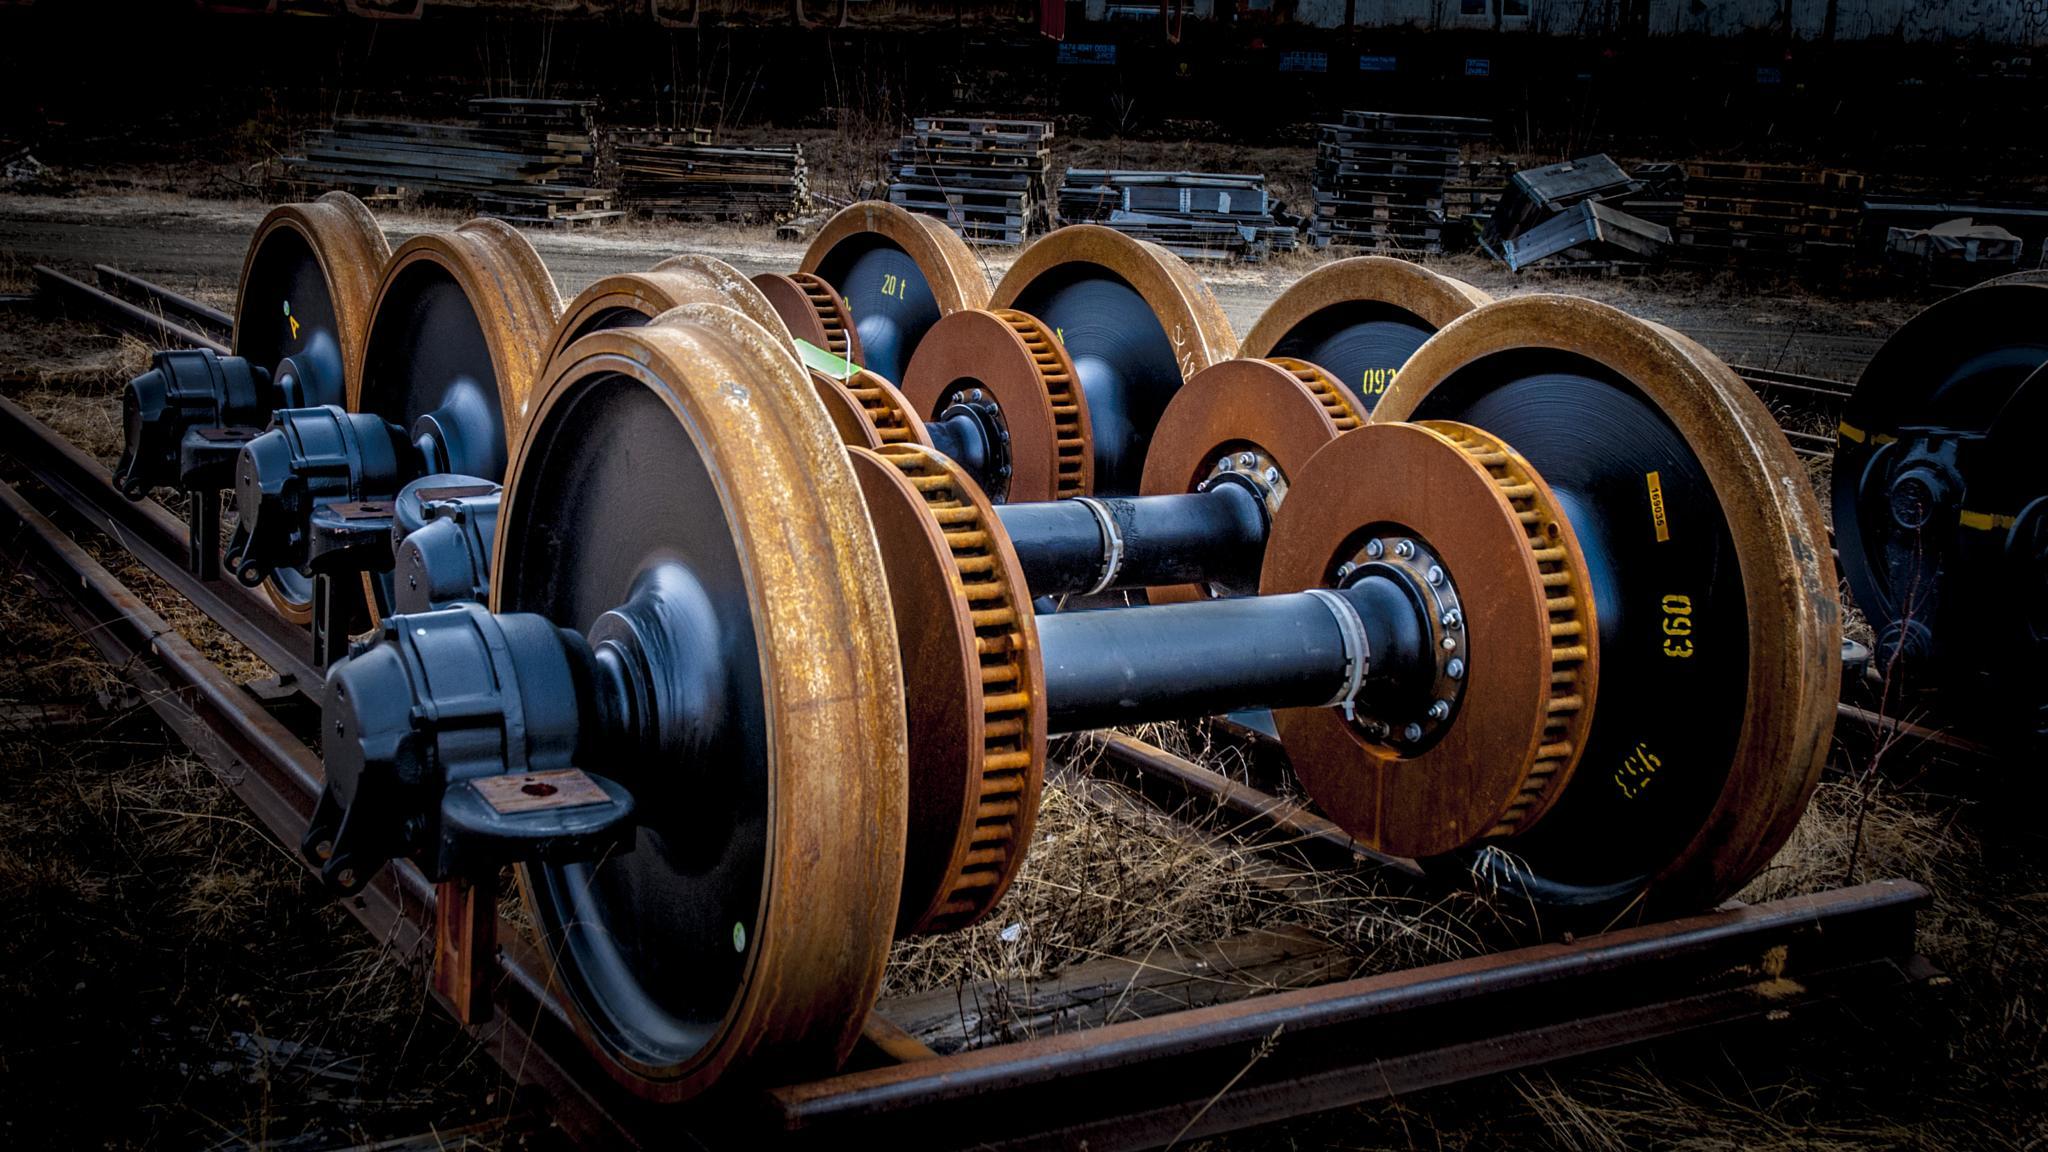 Wheels by Lautaro.Diaz.Photo